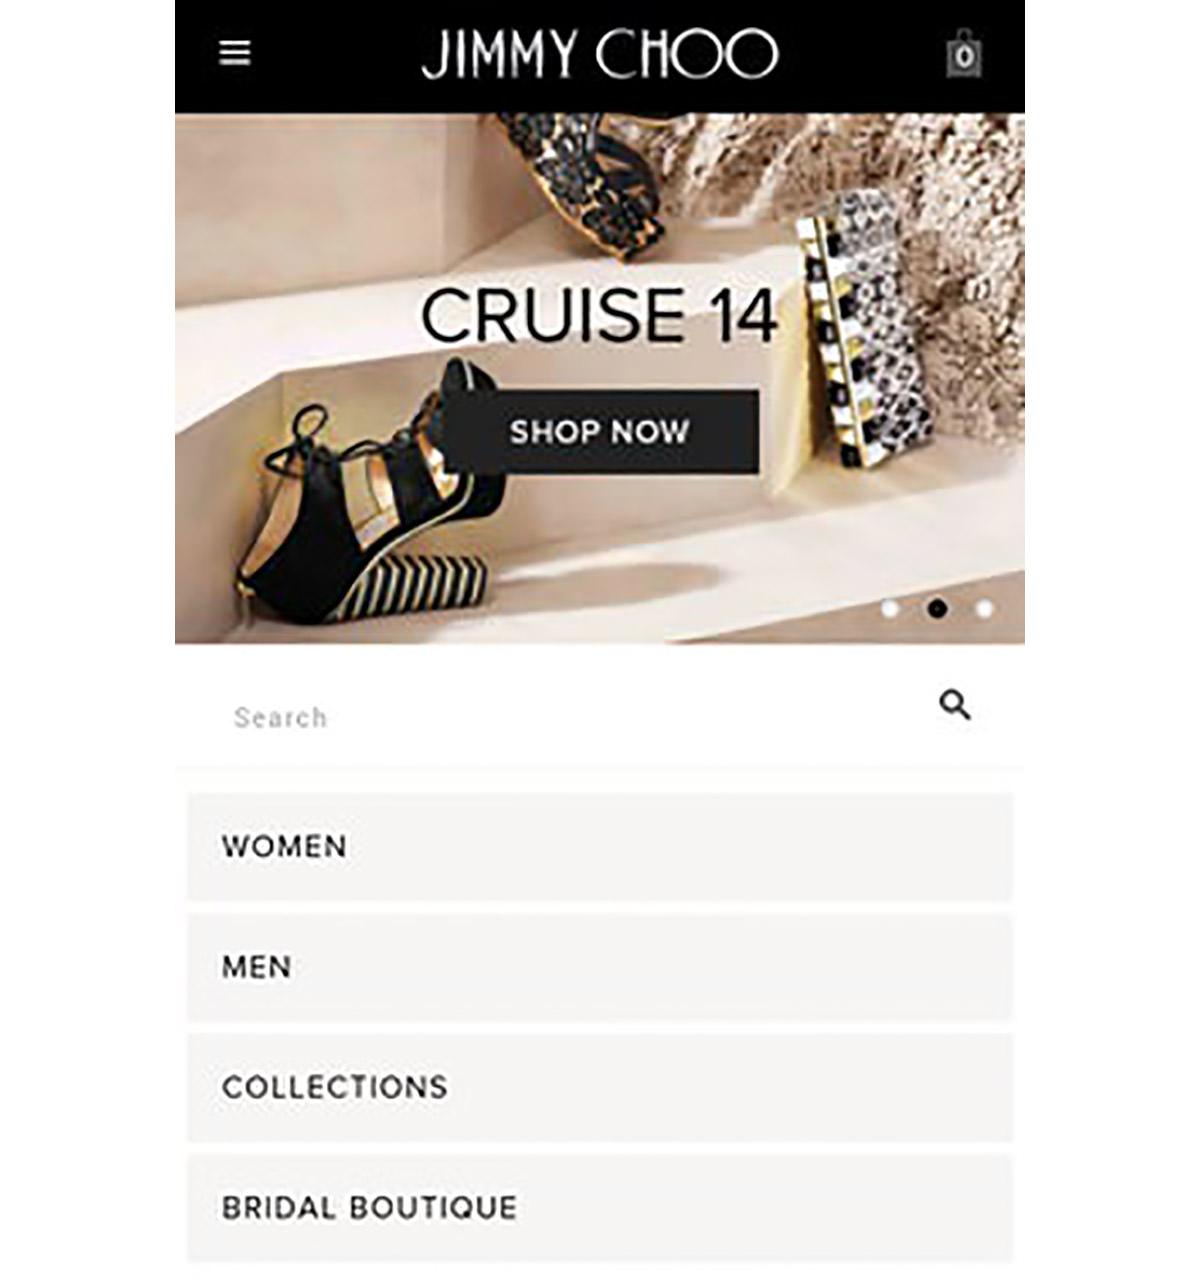 jimmy choo website